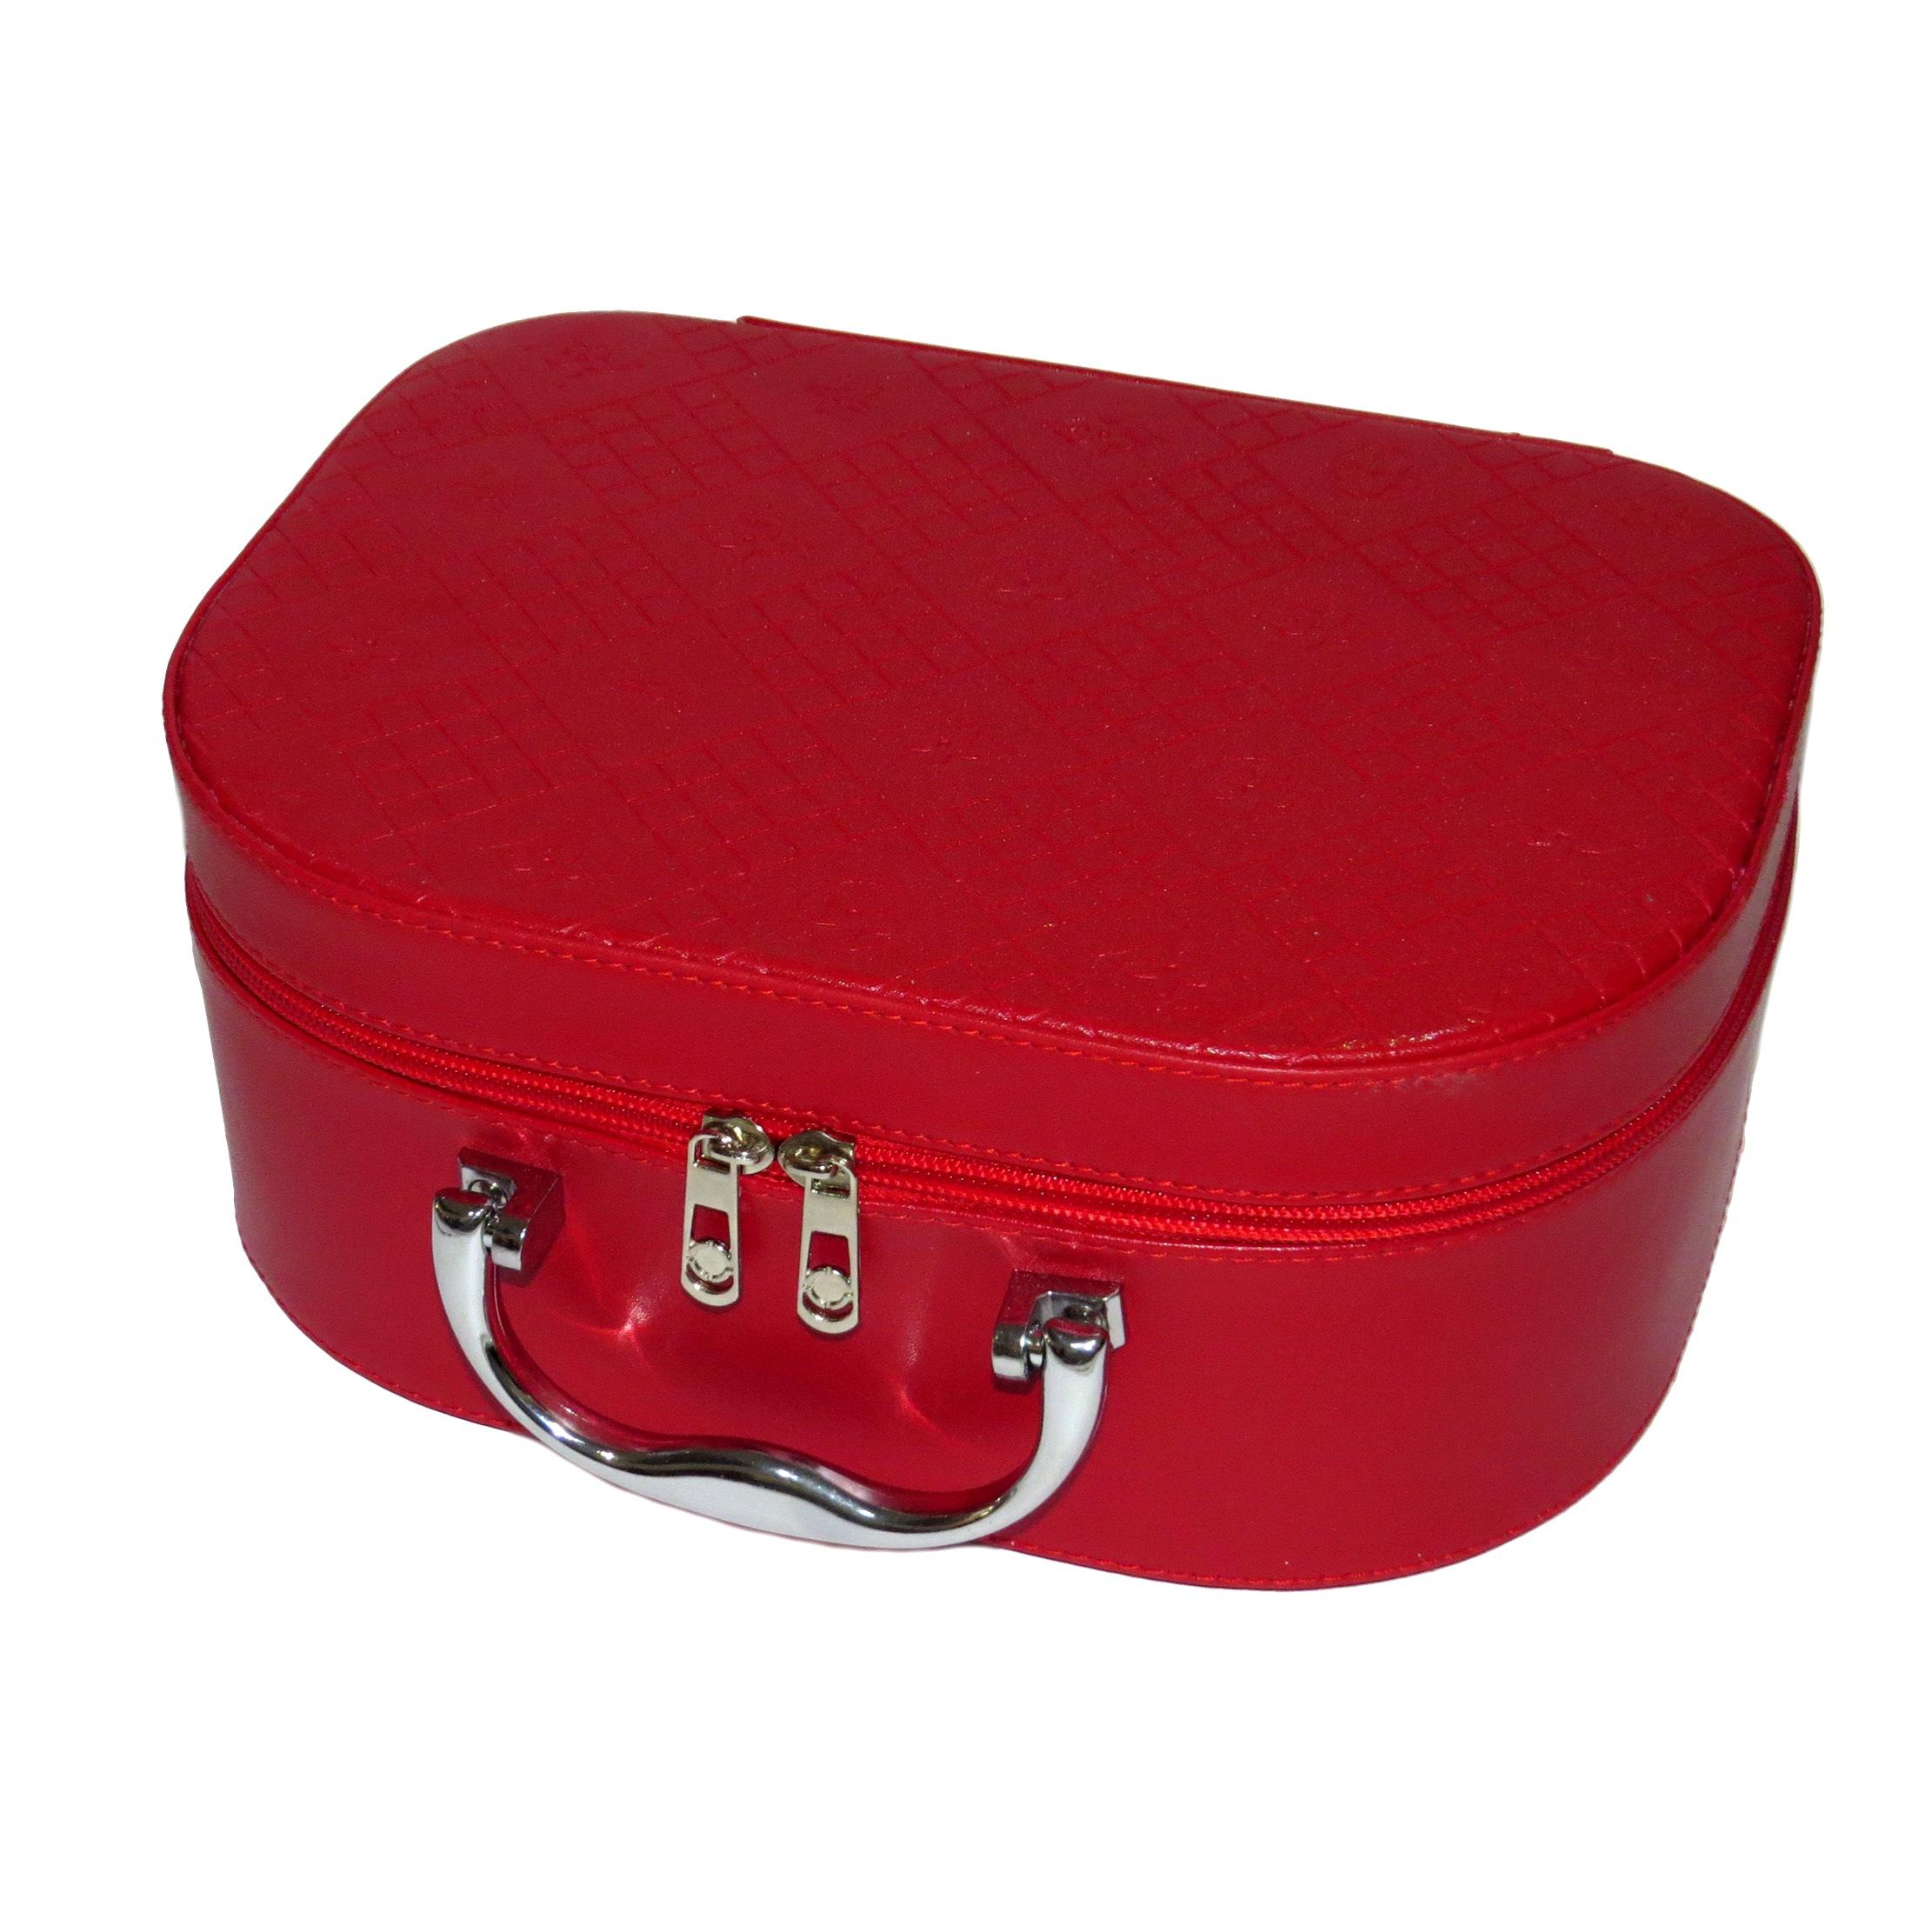 قیمت جعبه لوازم آرایشی کد DL_953_22